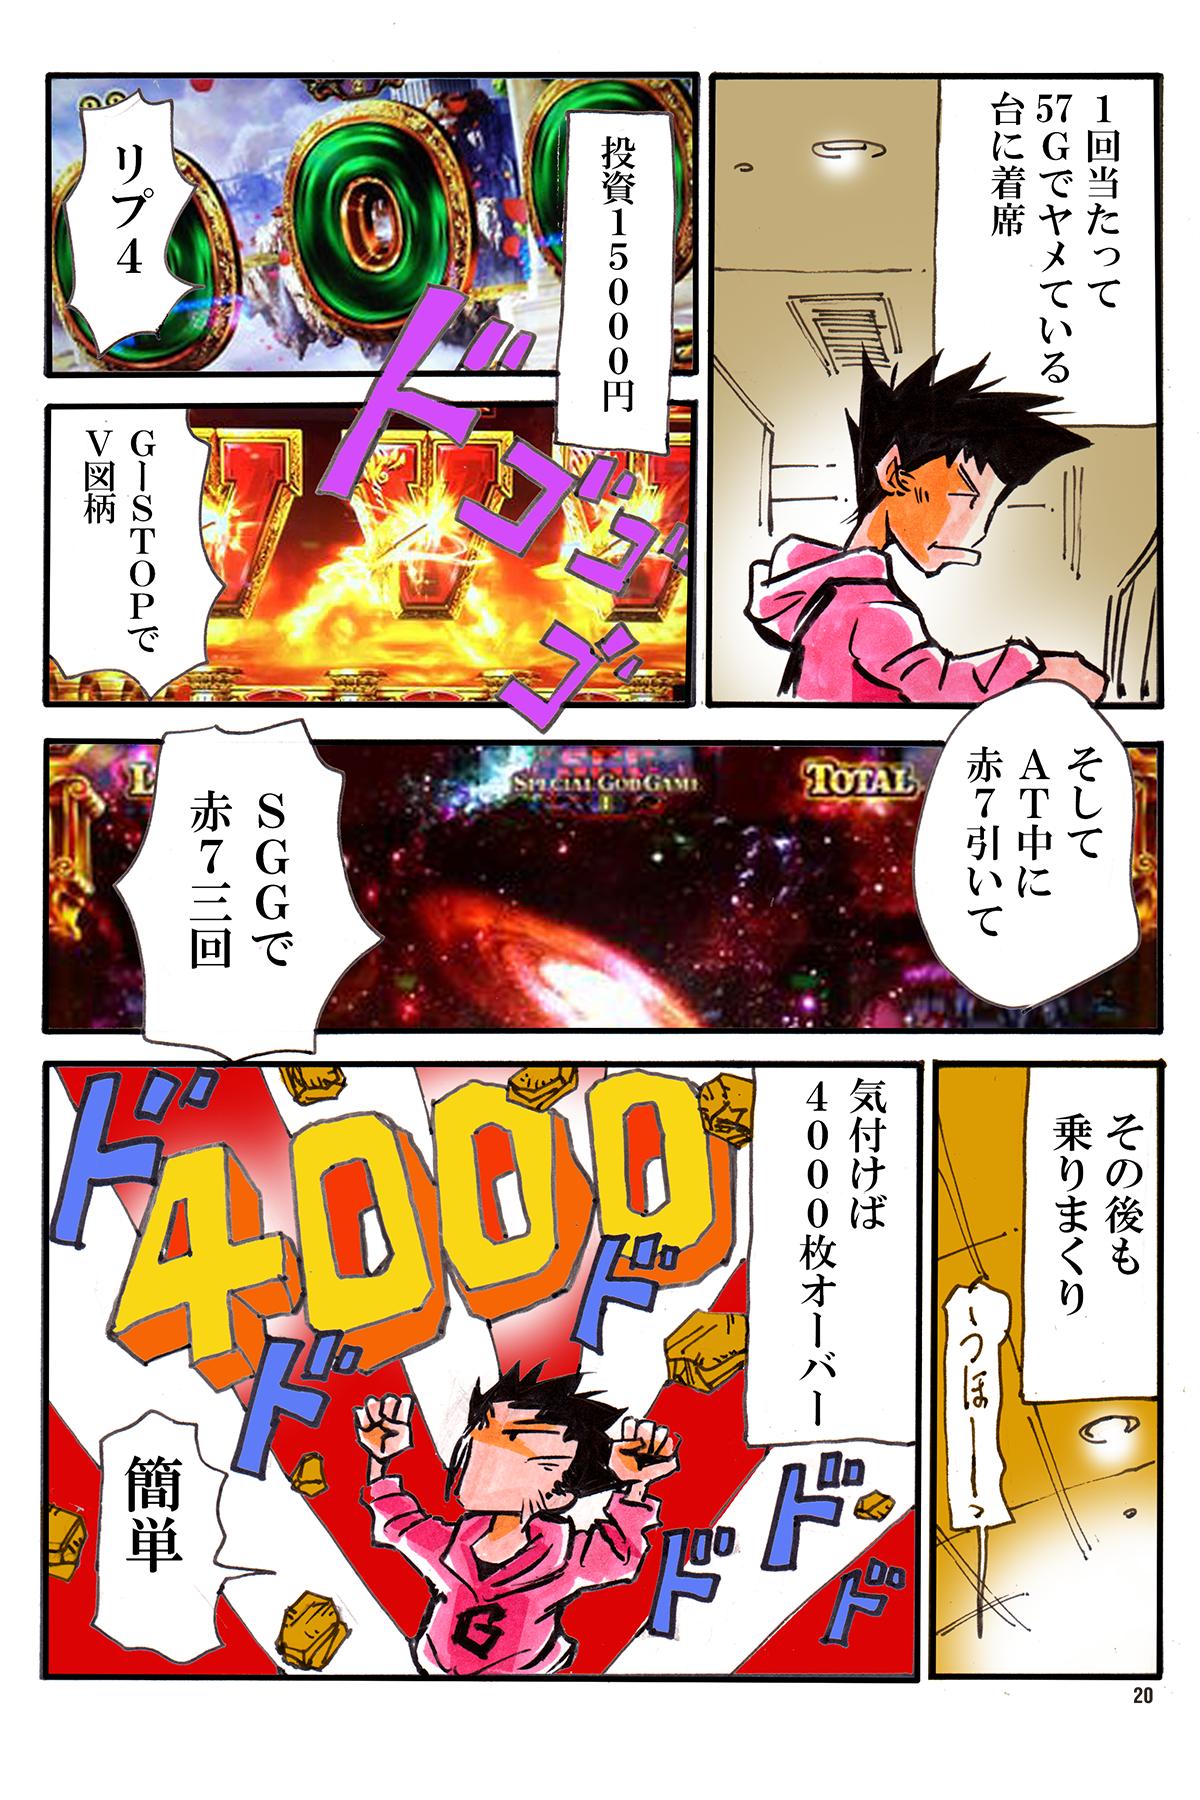 vol.3-4ティアラ大潜入